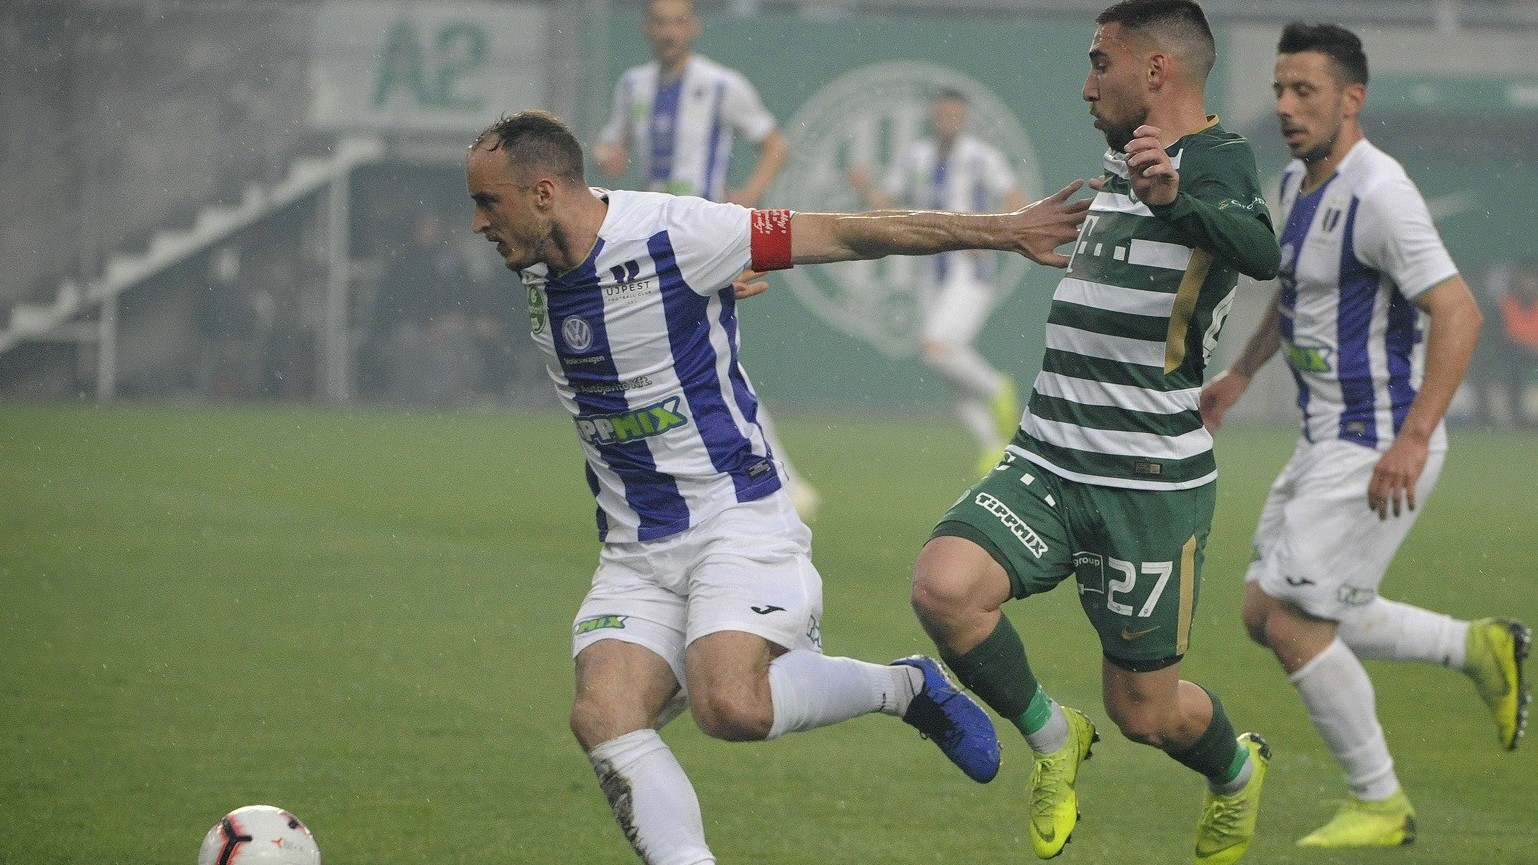 OTP Bank Liga - 31. forduló - A Fradi nyerte a derbit